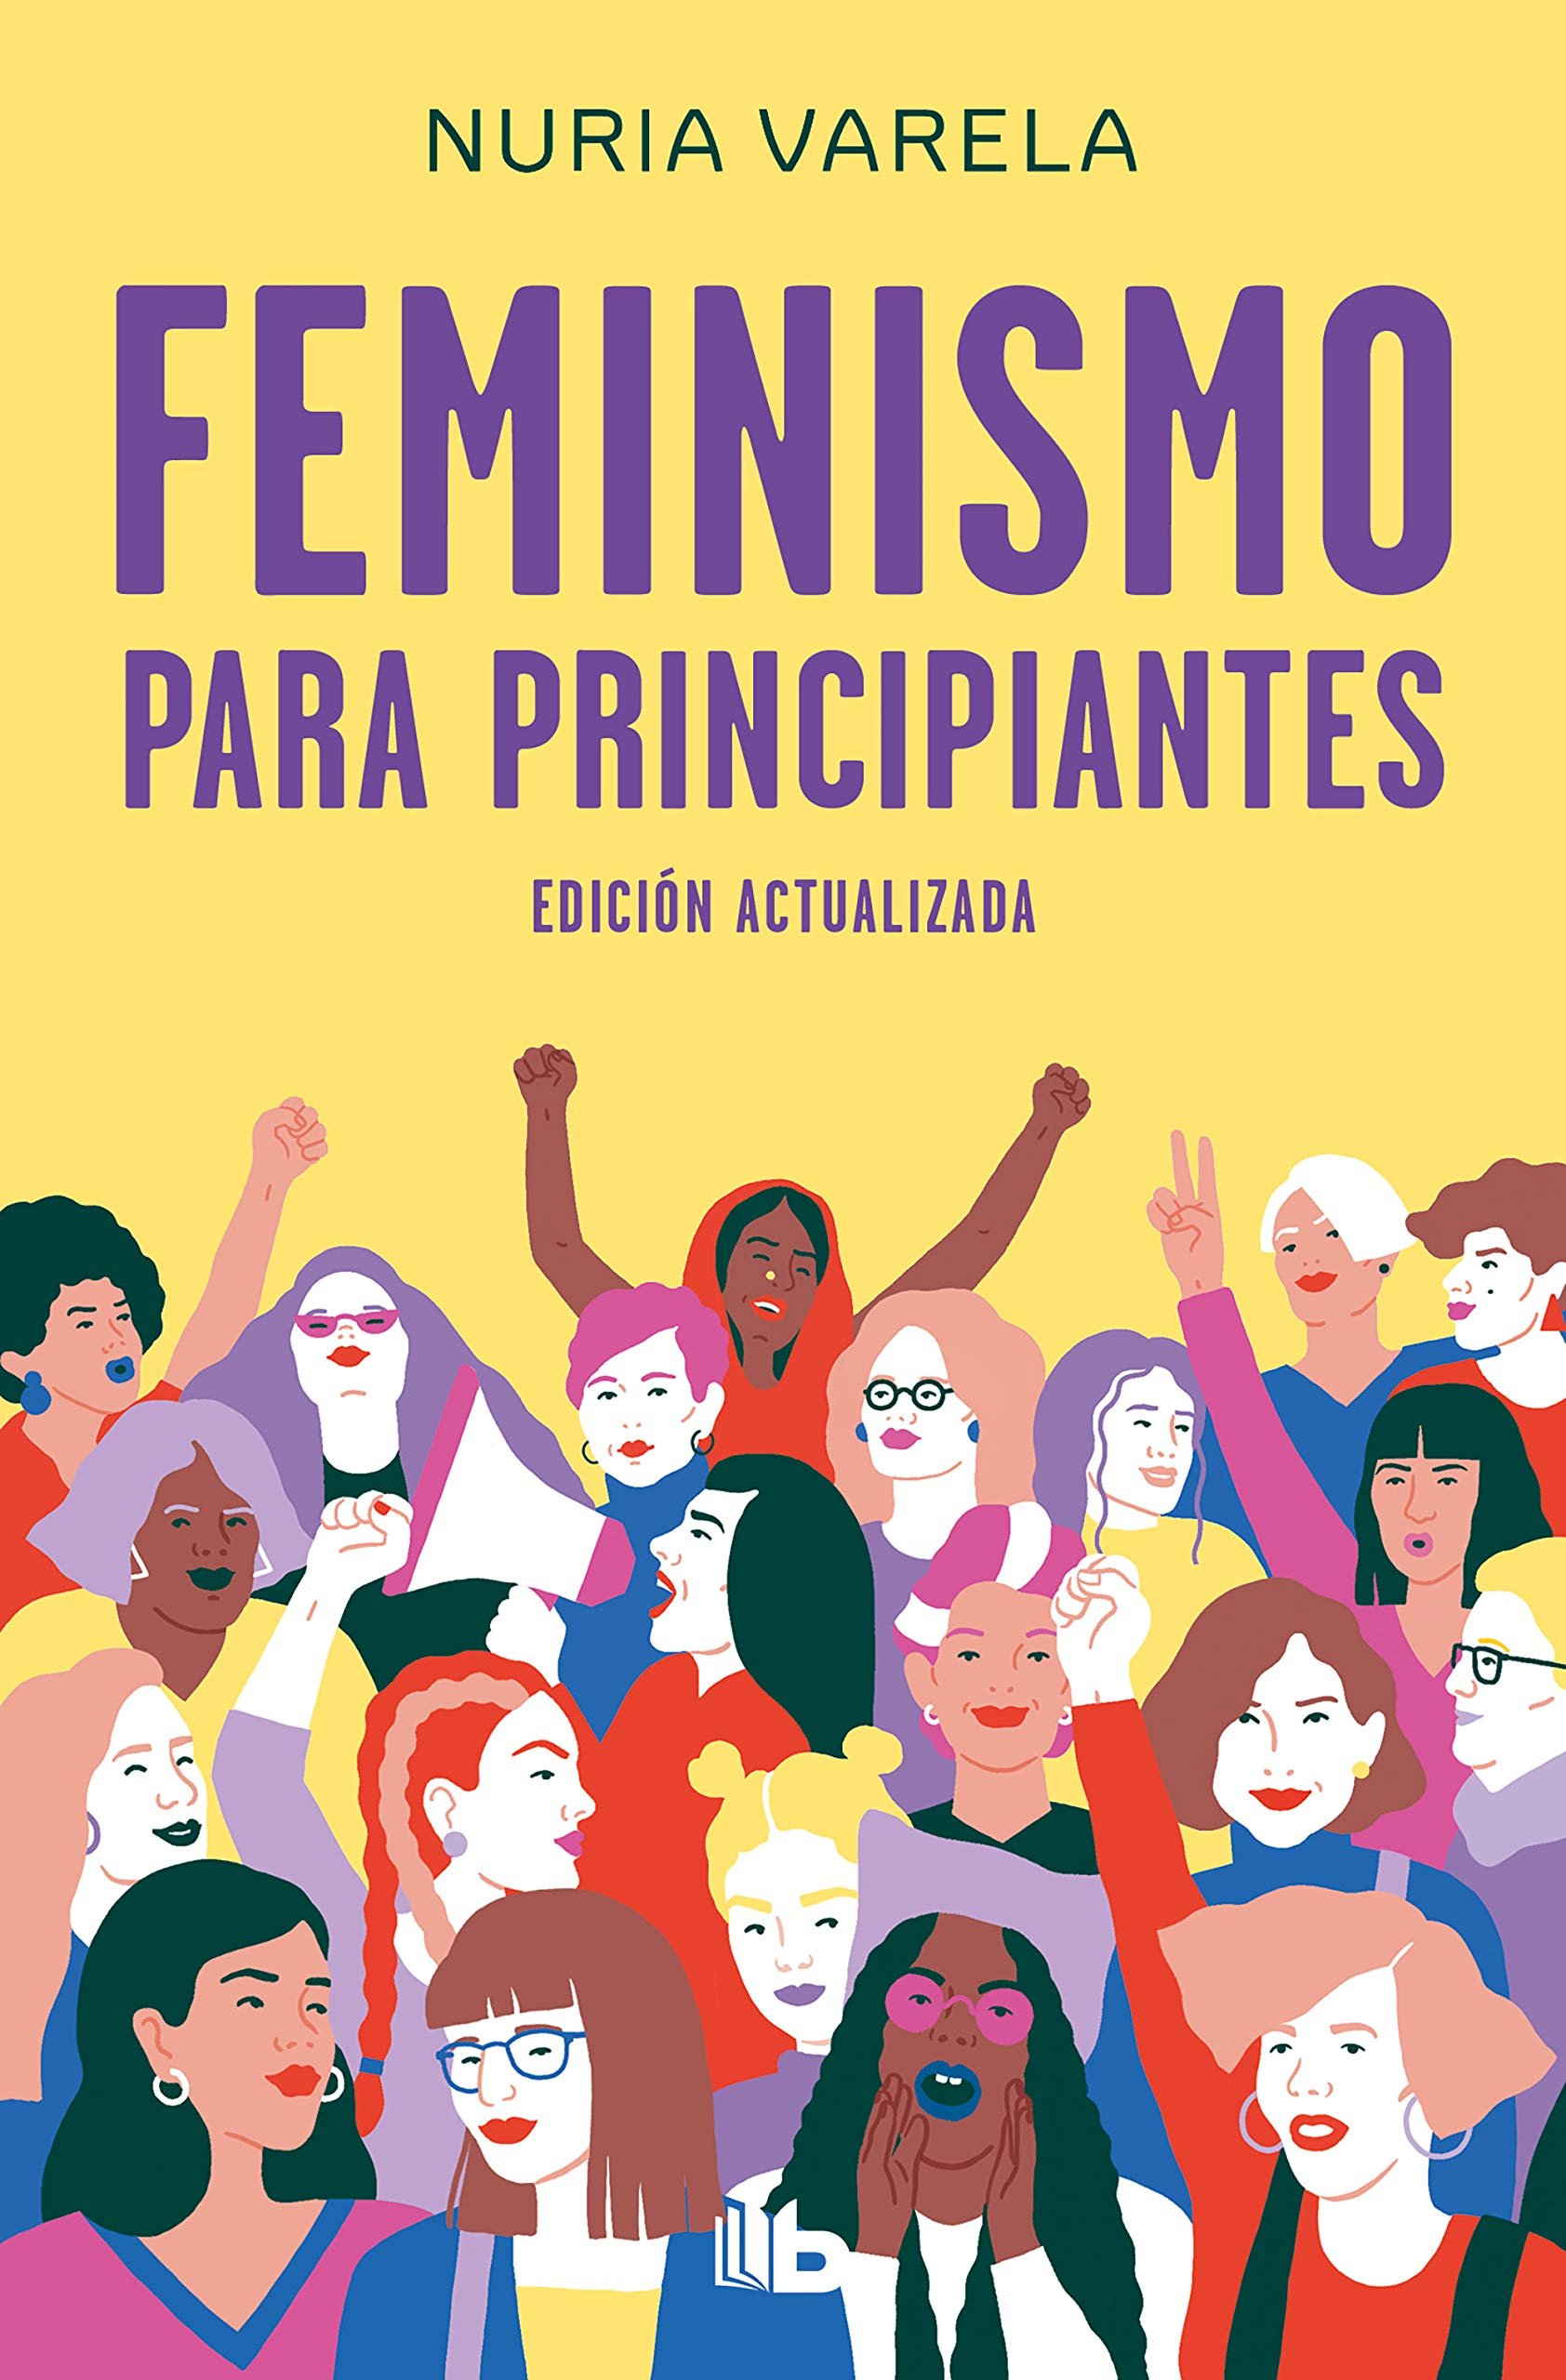 Feminismo para principiantes edición actualizada No ficción: Amazon.es: Varela, Nuria: Libros